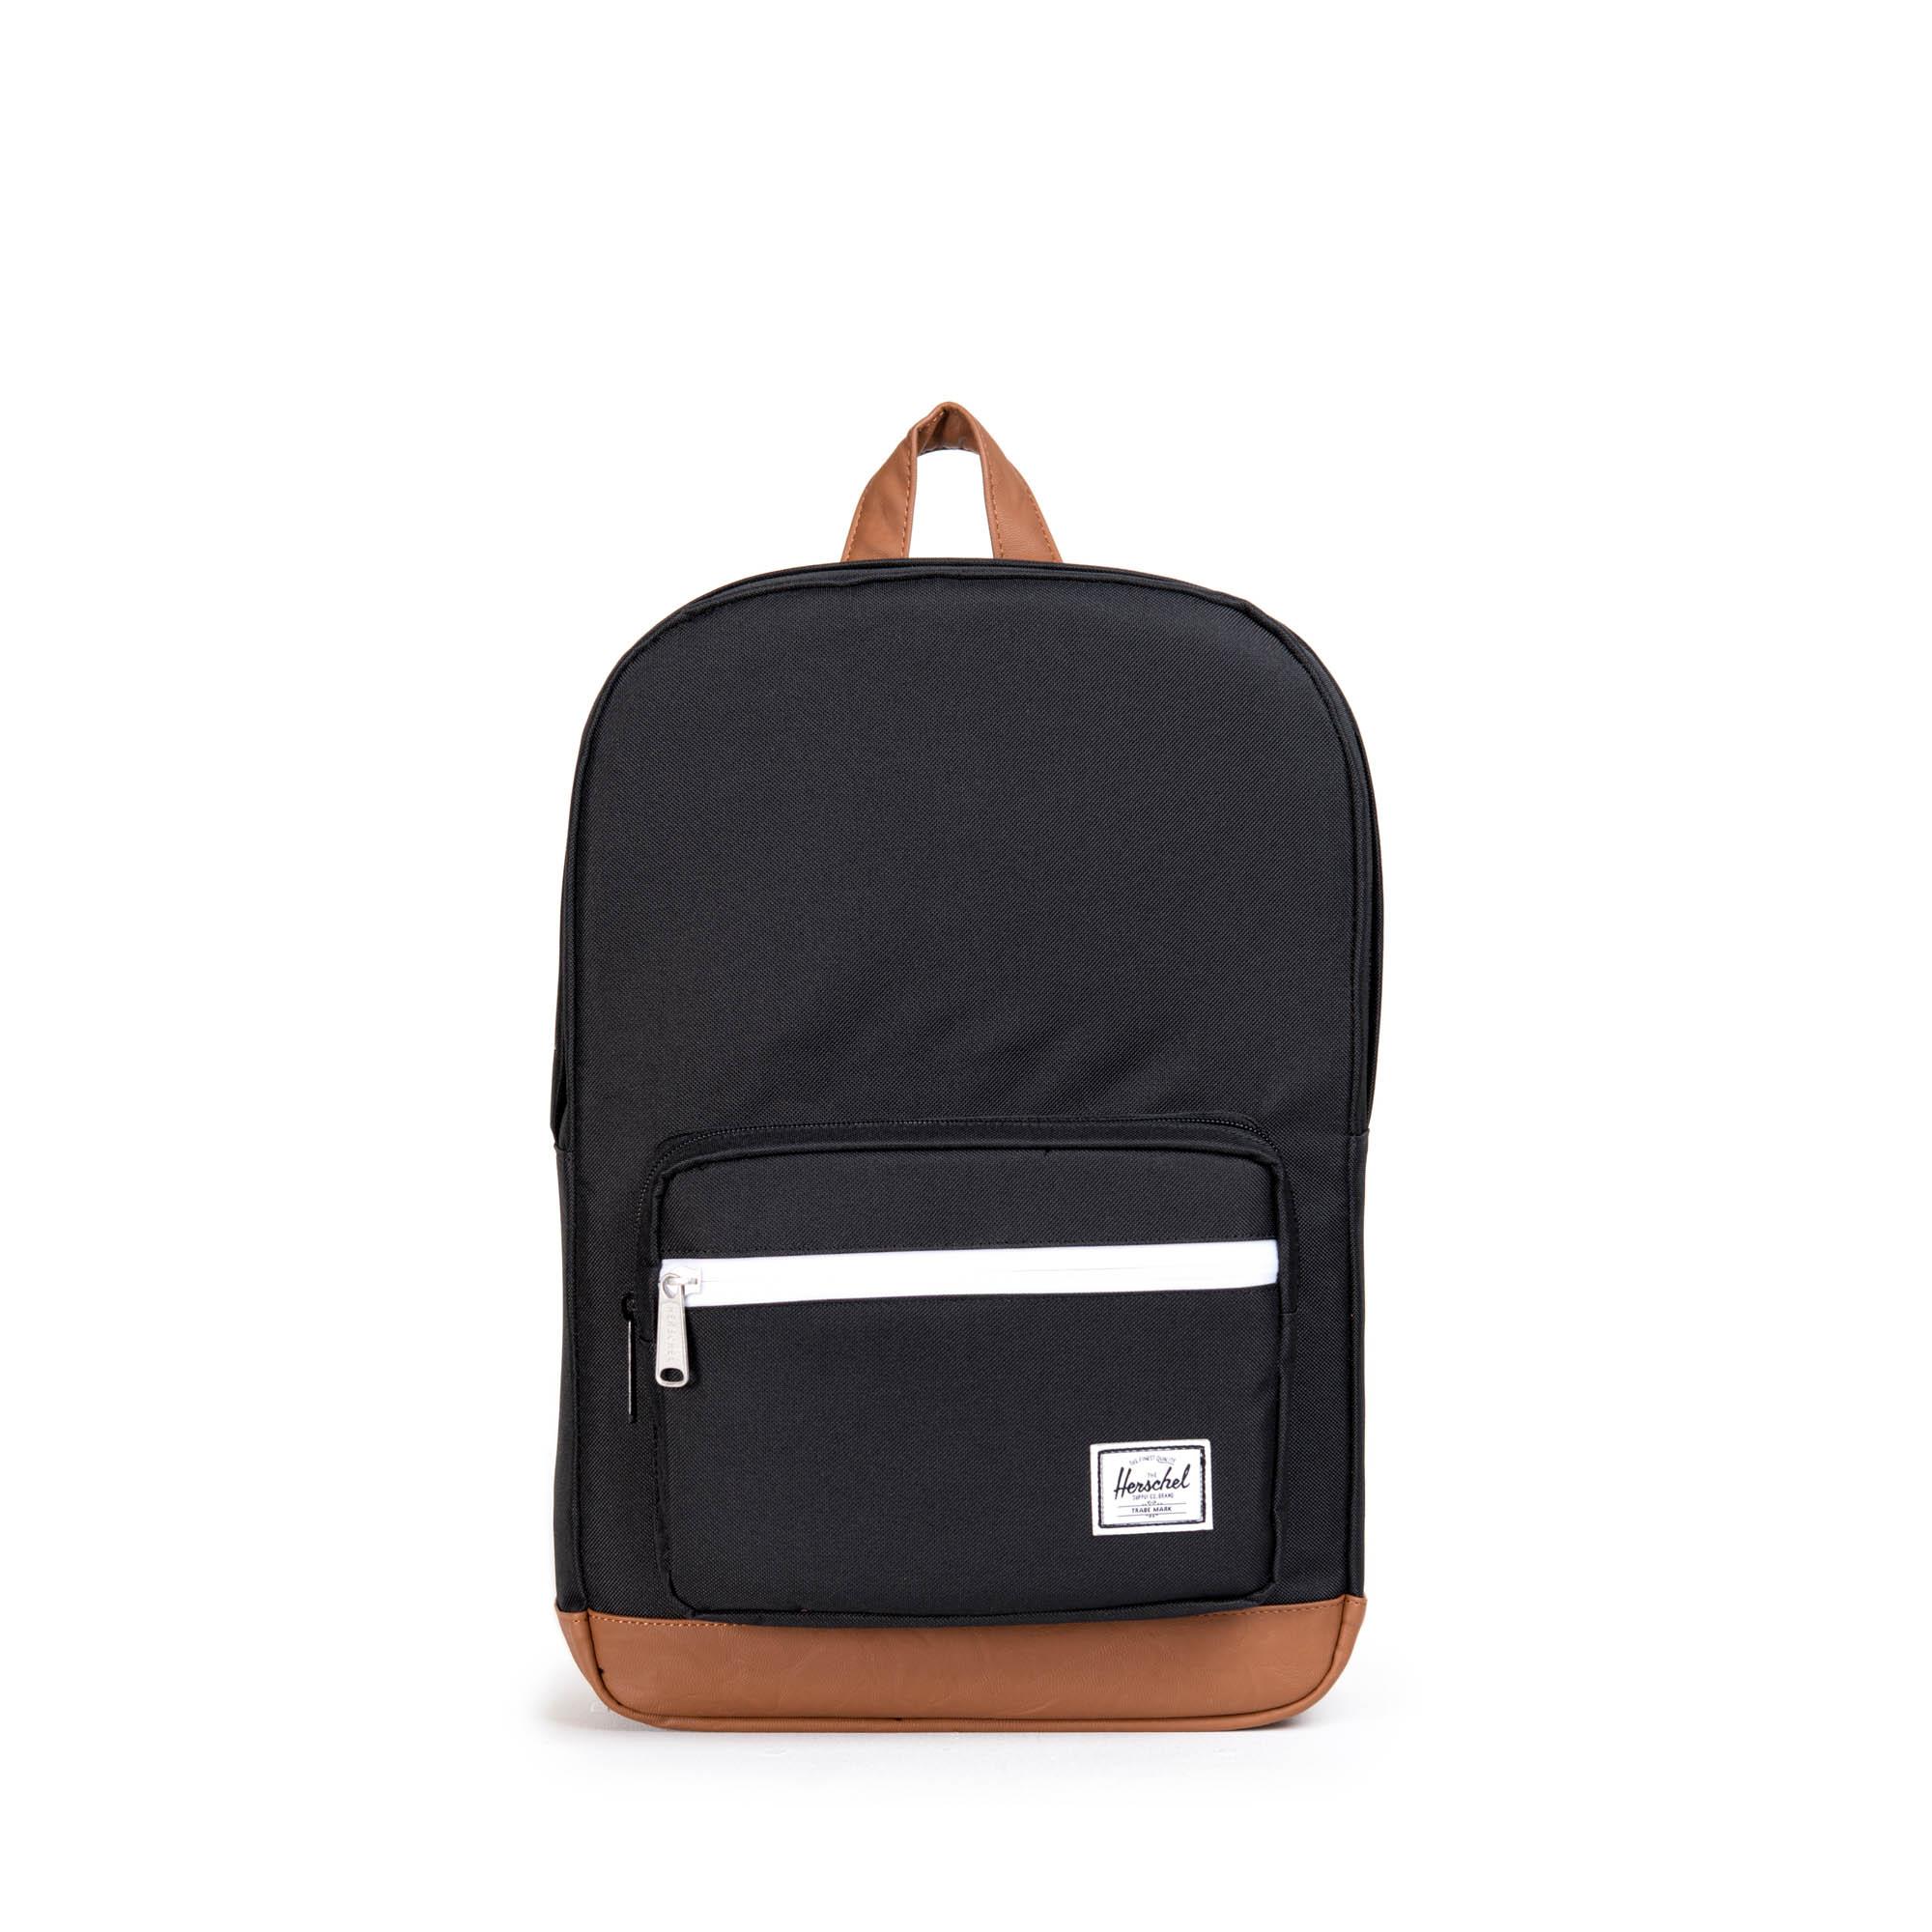 4e5b31b95ac Pop Quiz Youth Backpack - Black Tan White - Flying Point Surf